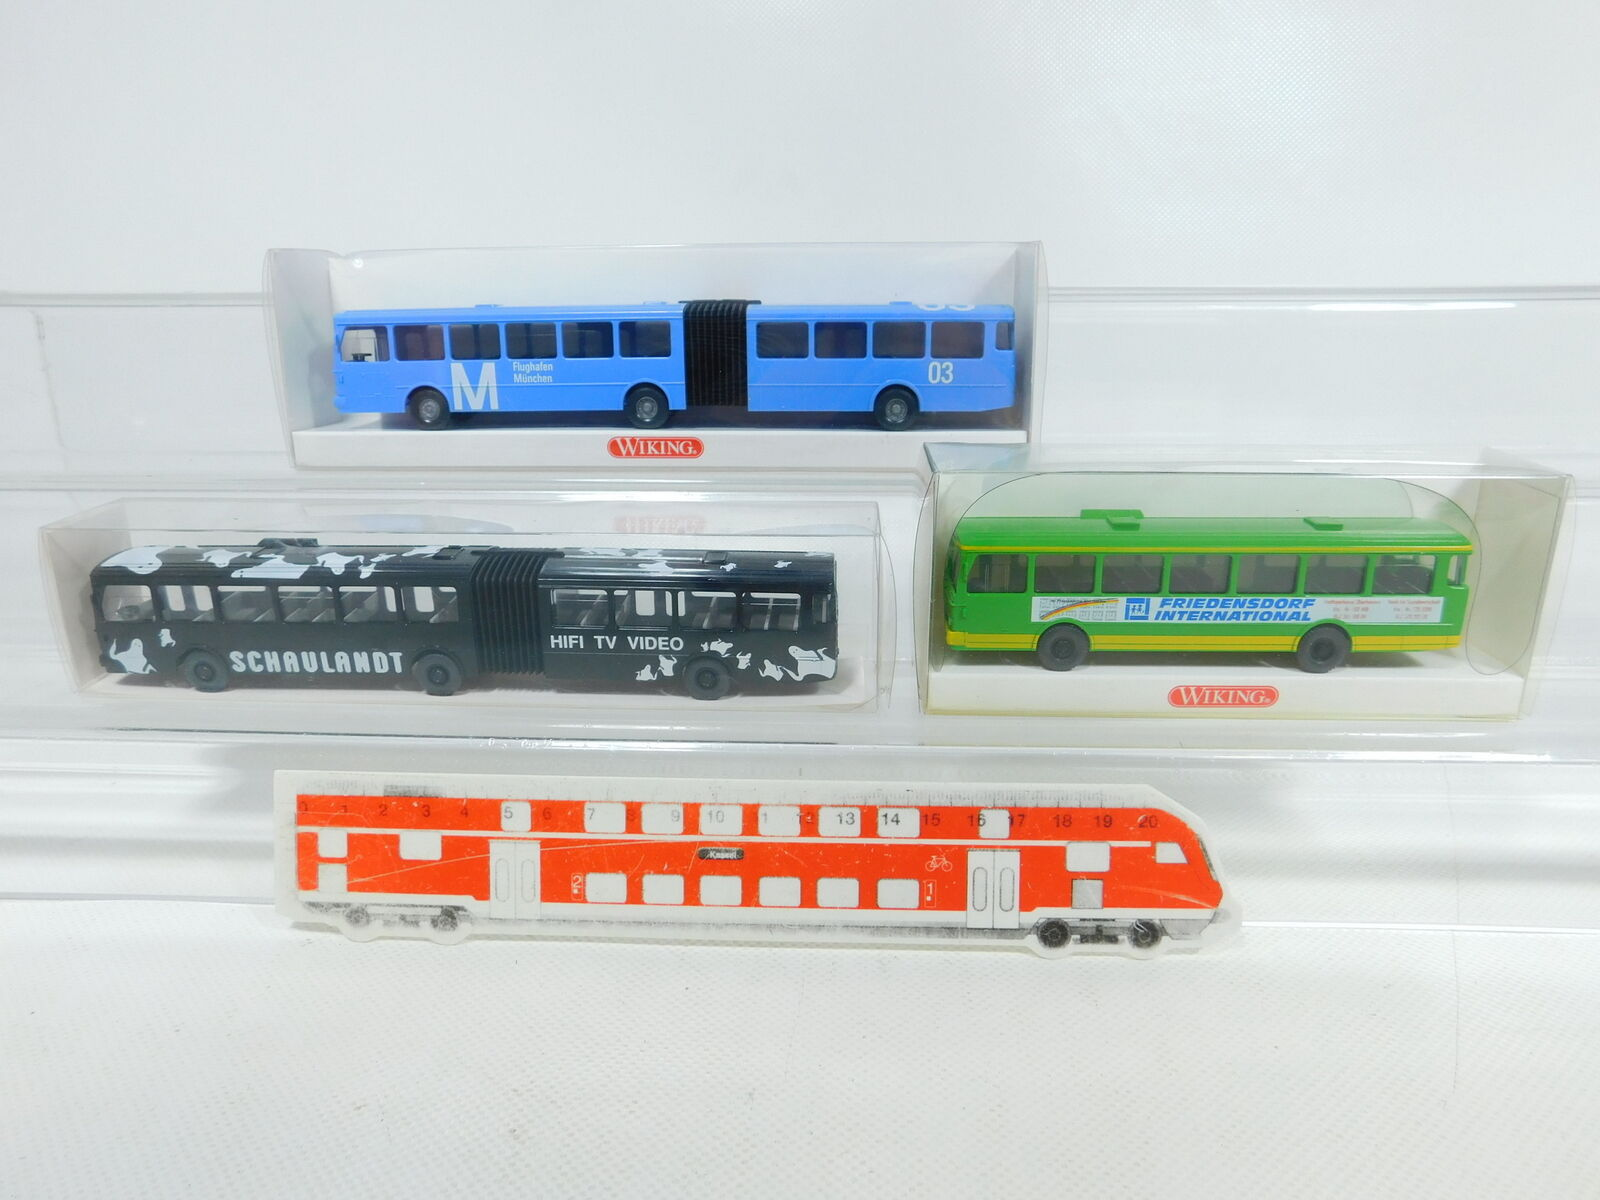 Bv952-0, 5  3x WIKING h0 1 87 Bus MB  70532 + 7050131 + FRIEDENSDORF, Neuw + neuf dans sa boîte